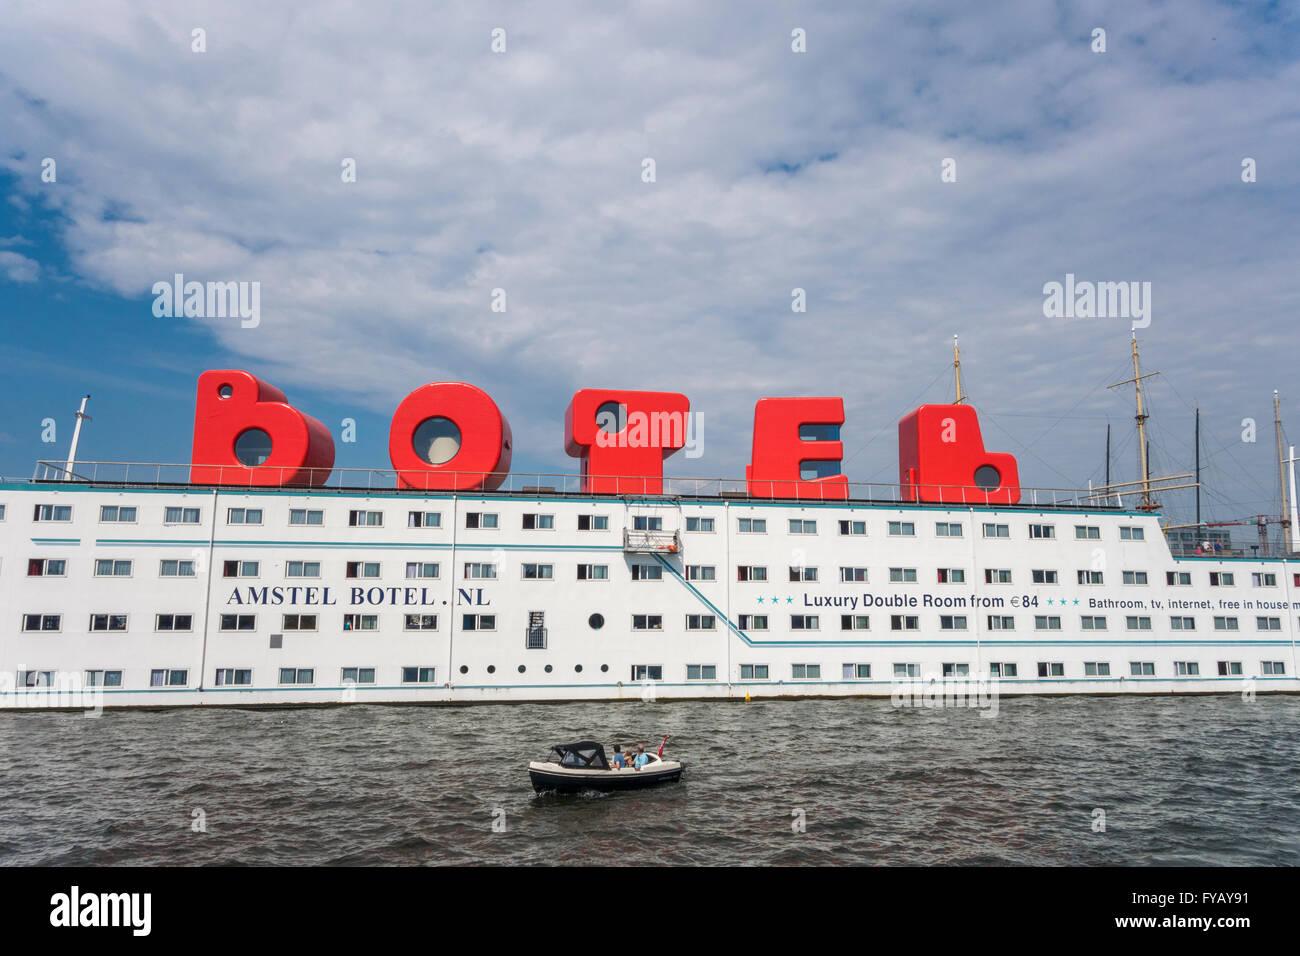 Amsterdam floating hotel amstel botel in amsterdam ij - Amstel hotel amsterdam ...